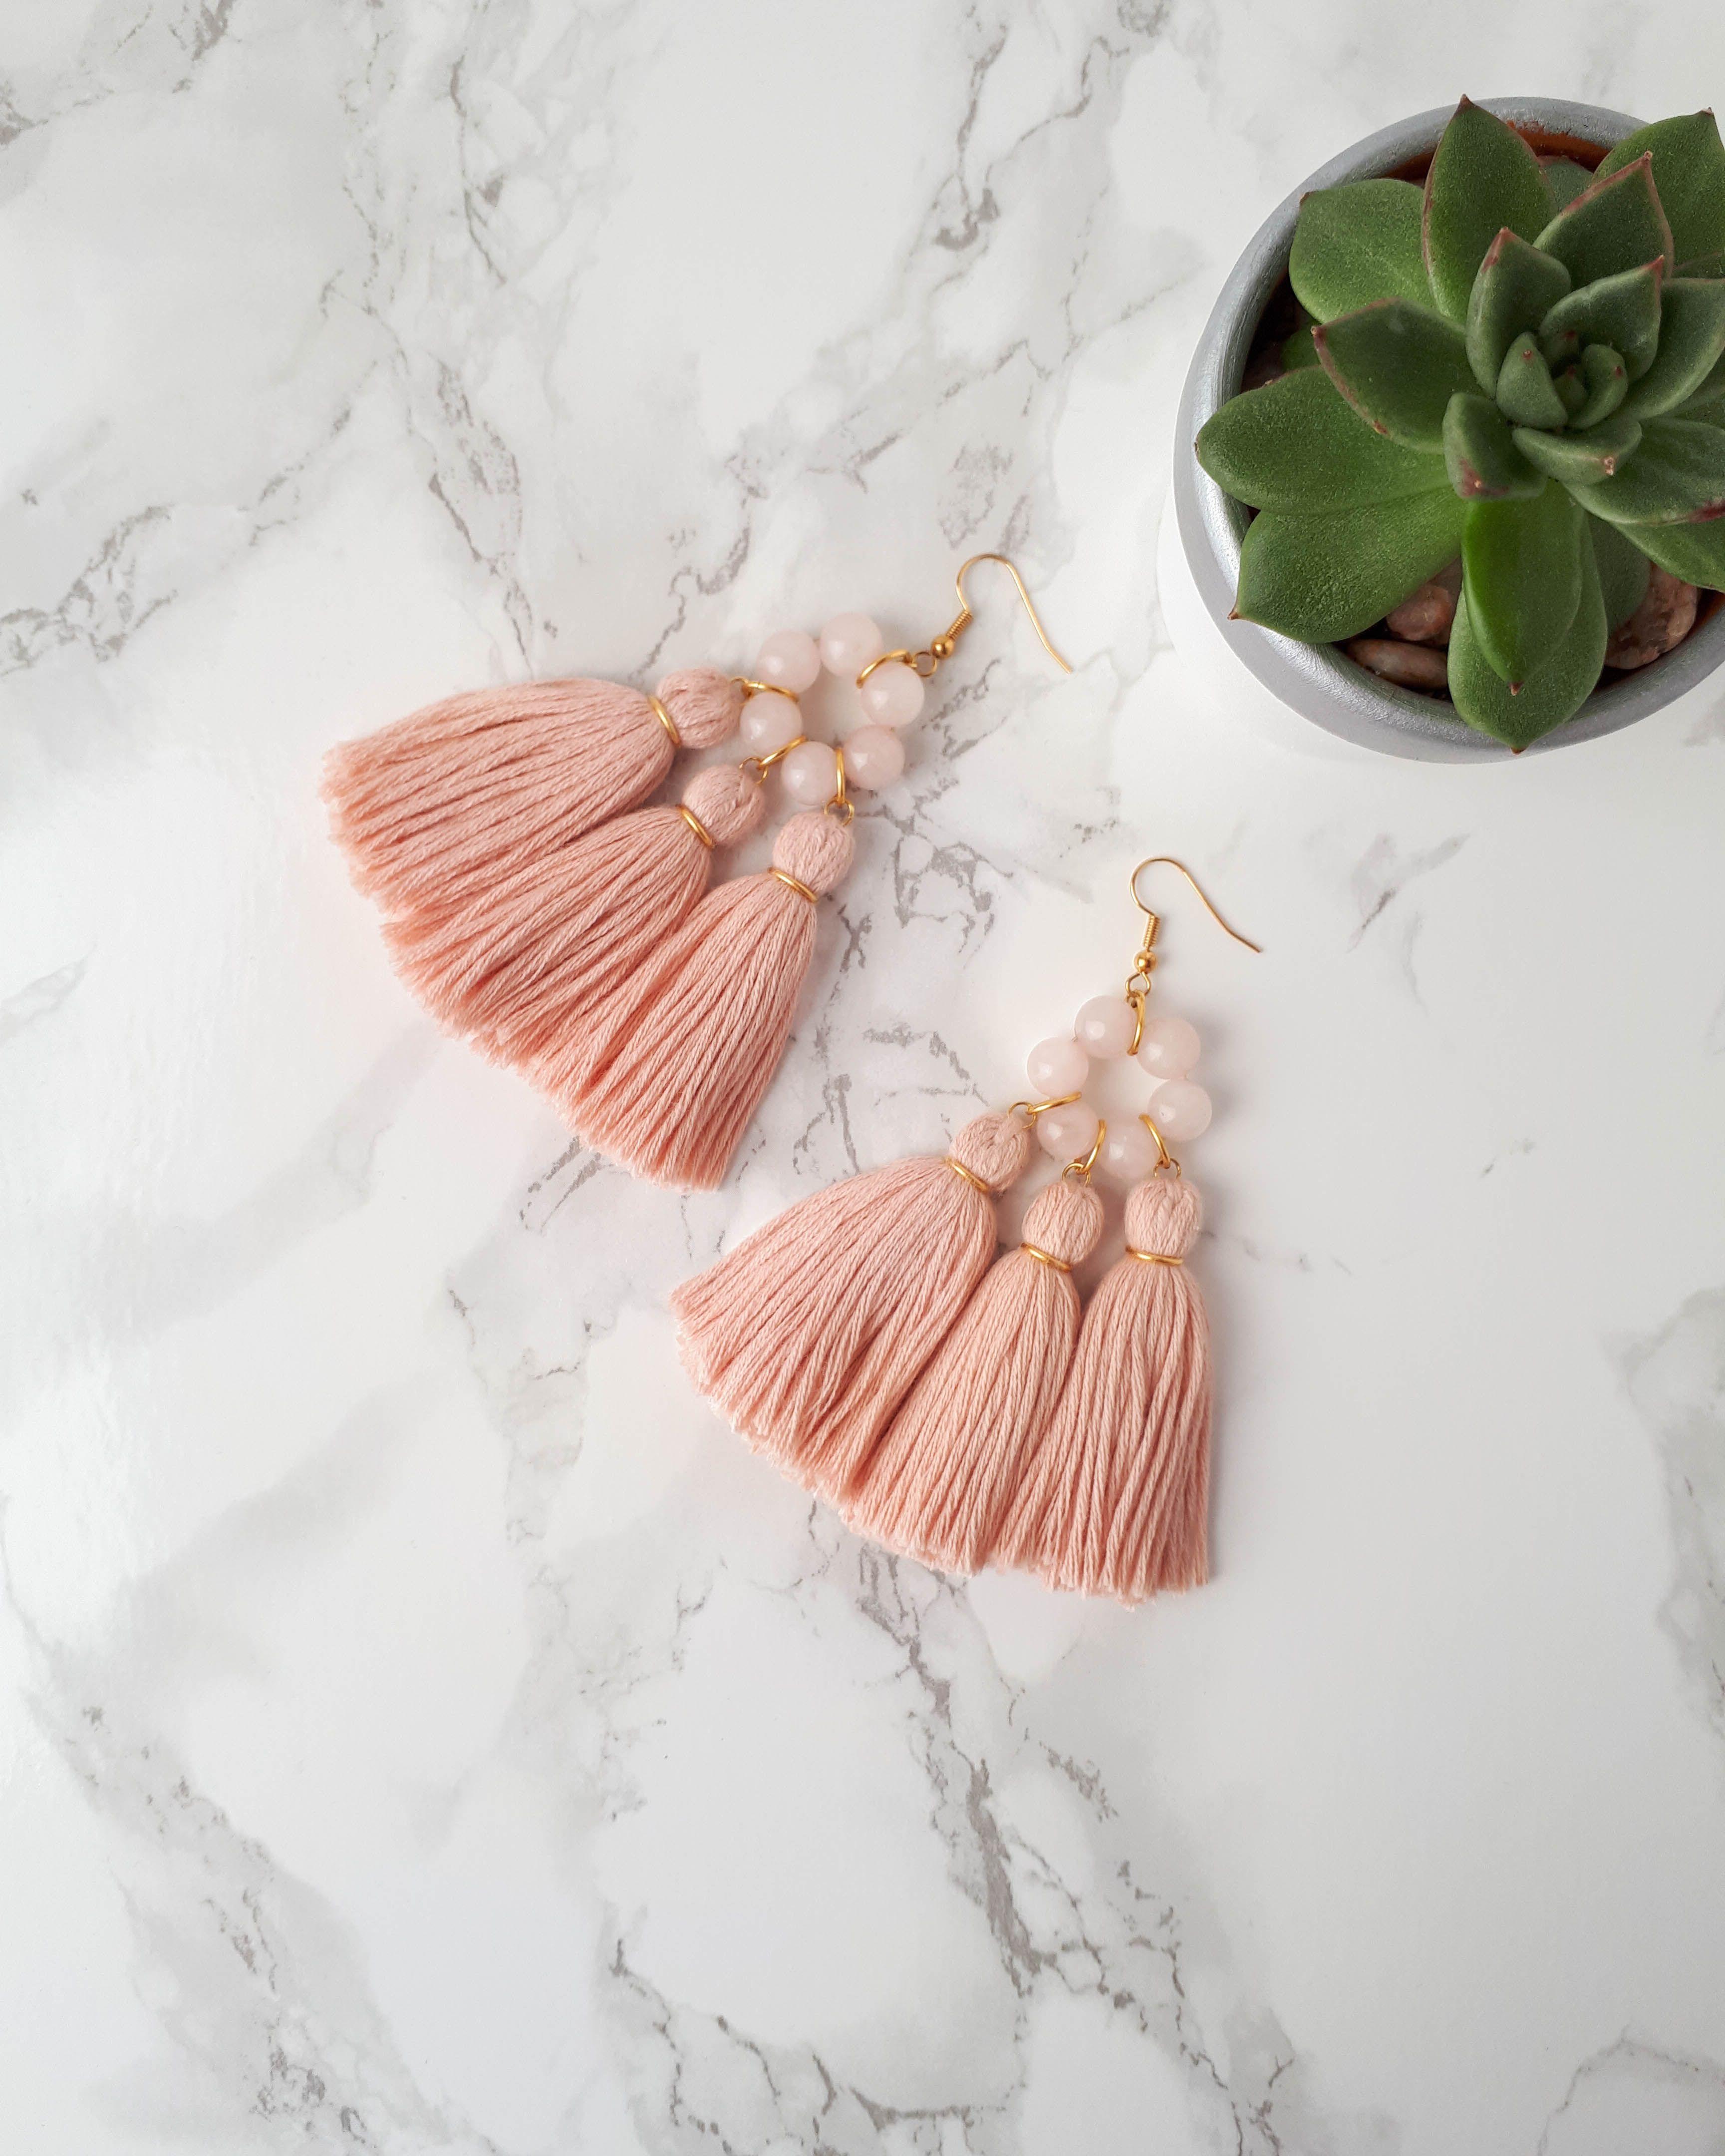 Blush Tassel Earrings Gold with Blush Tassels Earrings Gift for Her Women/'s Fringe Earrings Women/'s Jewelry